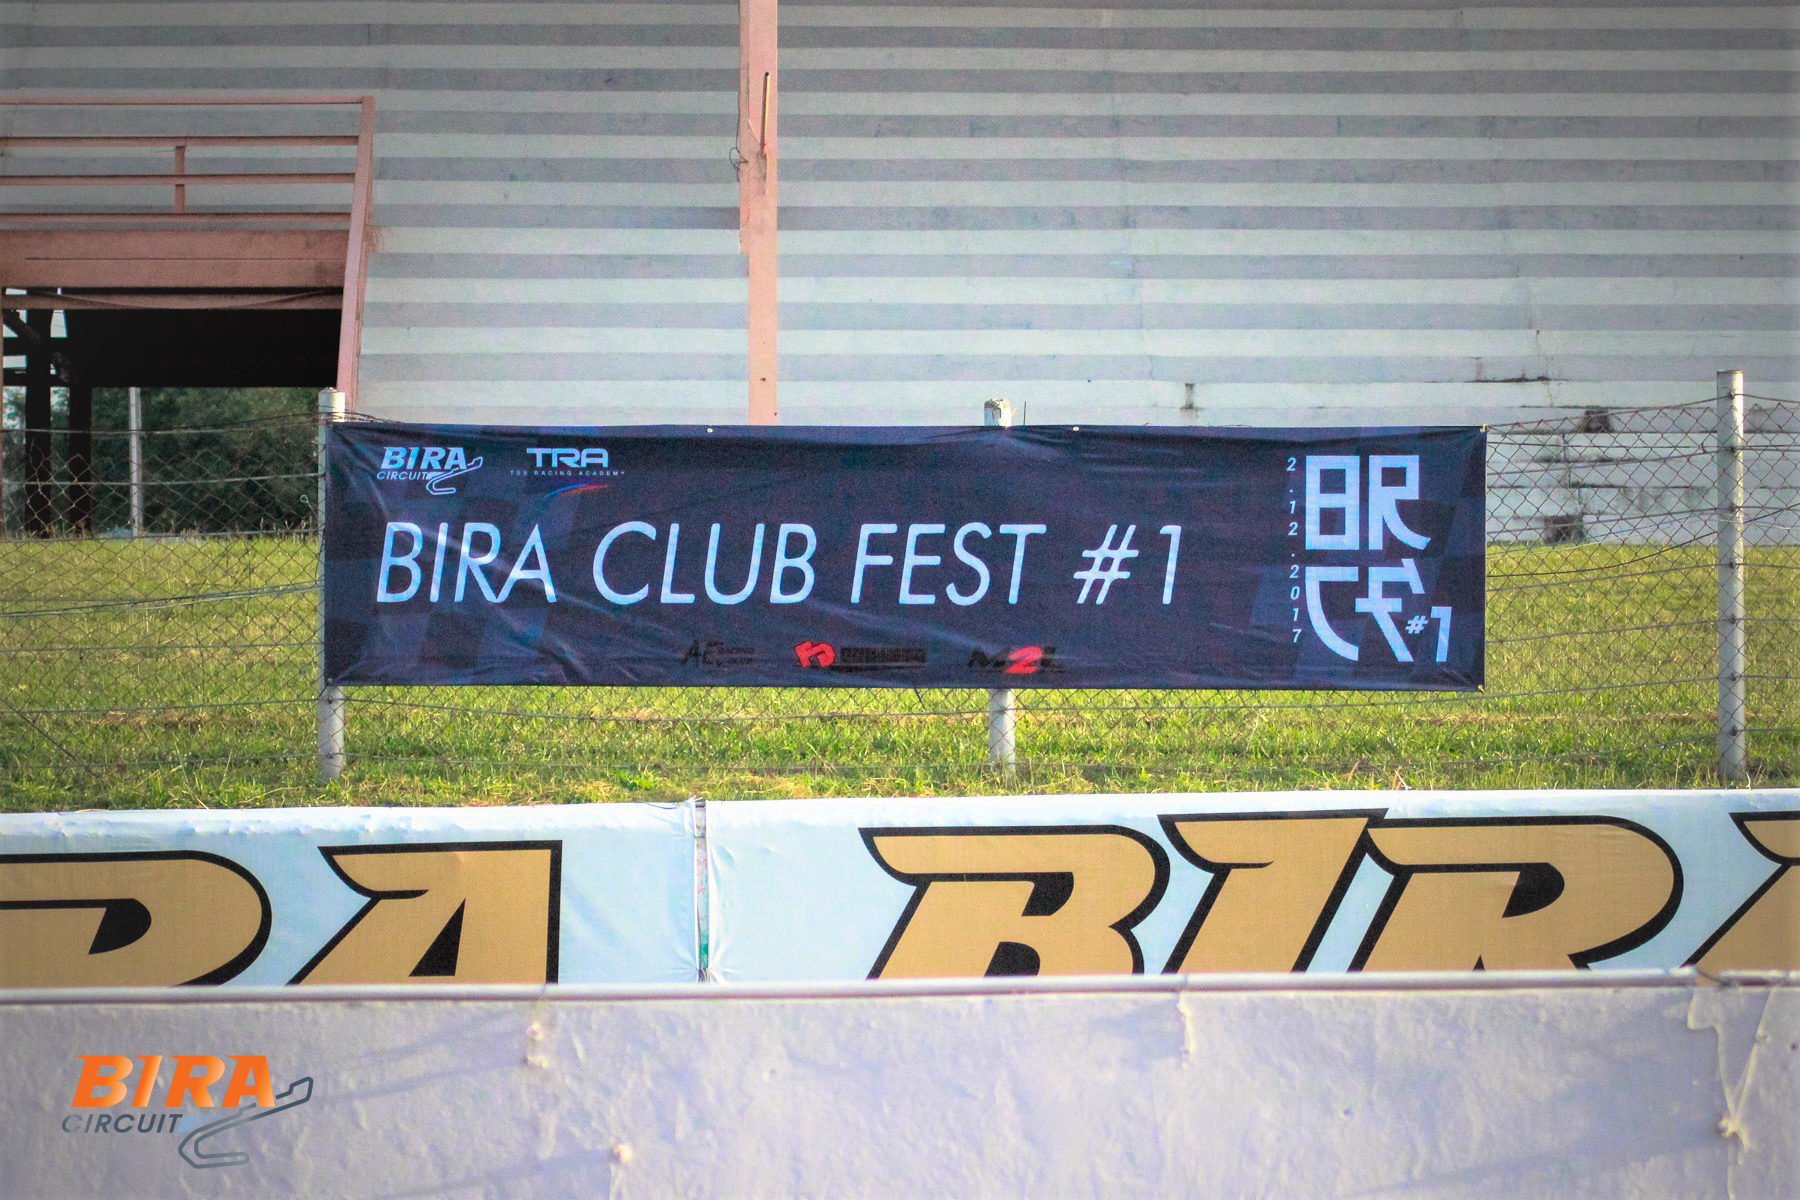 Brcf 1 Bira Circuit Scoreboard